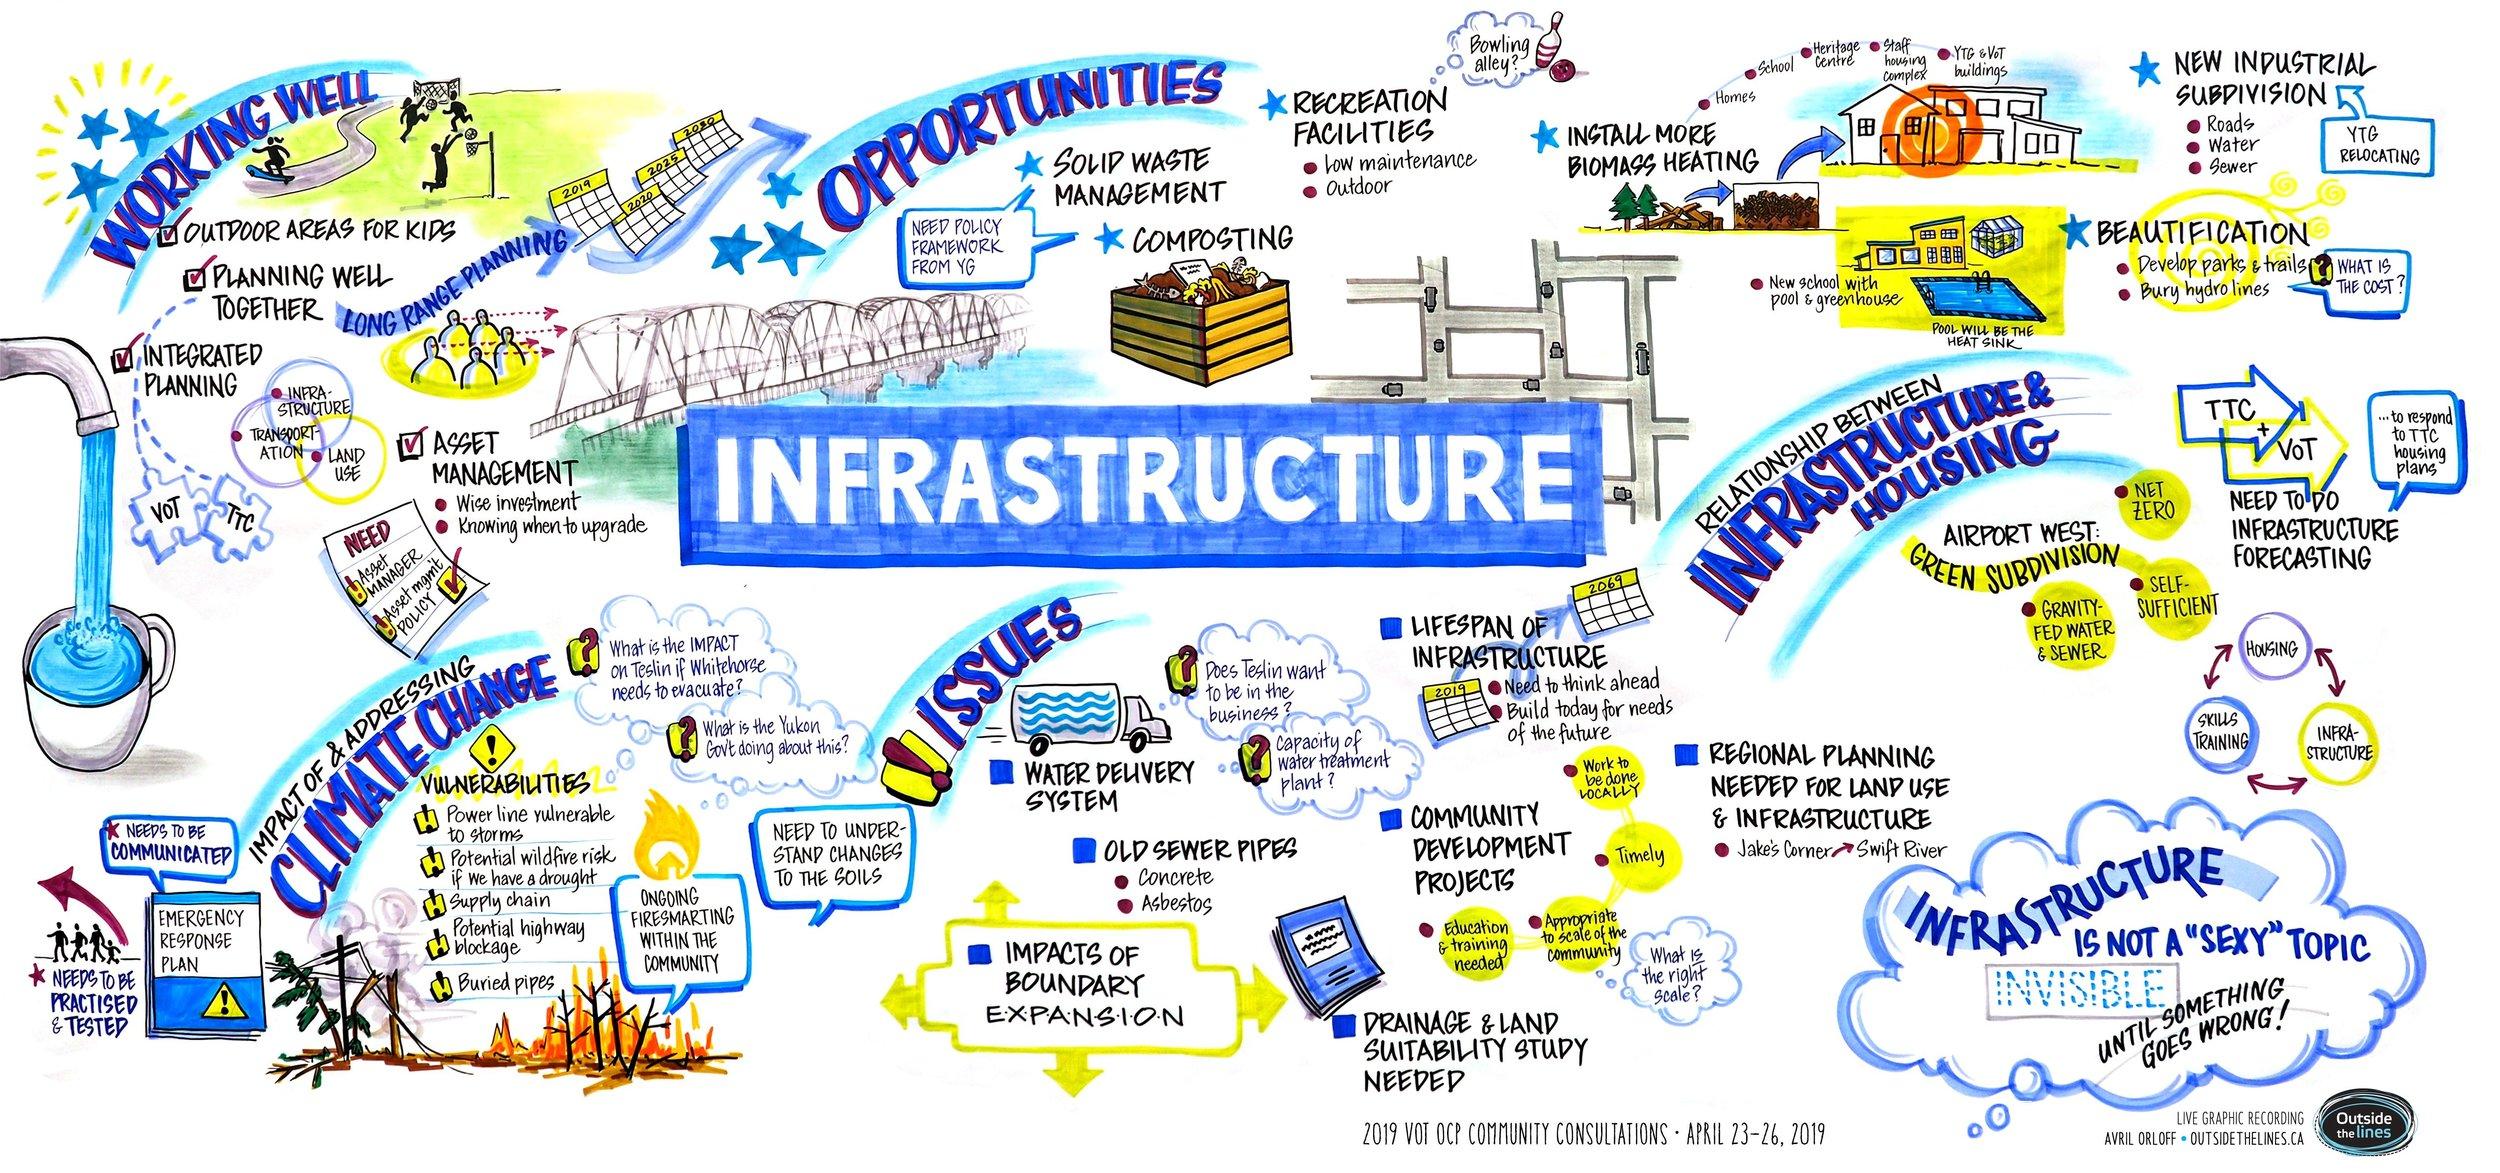 Infrastructure